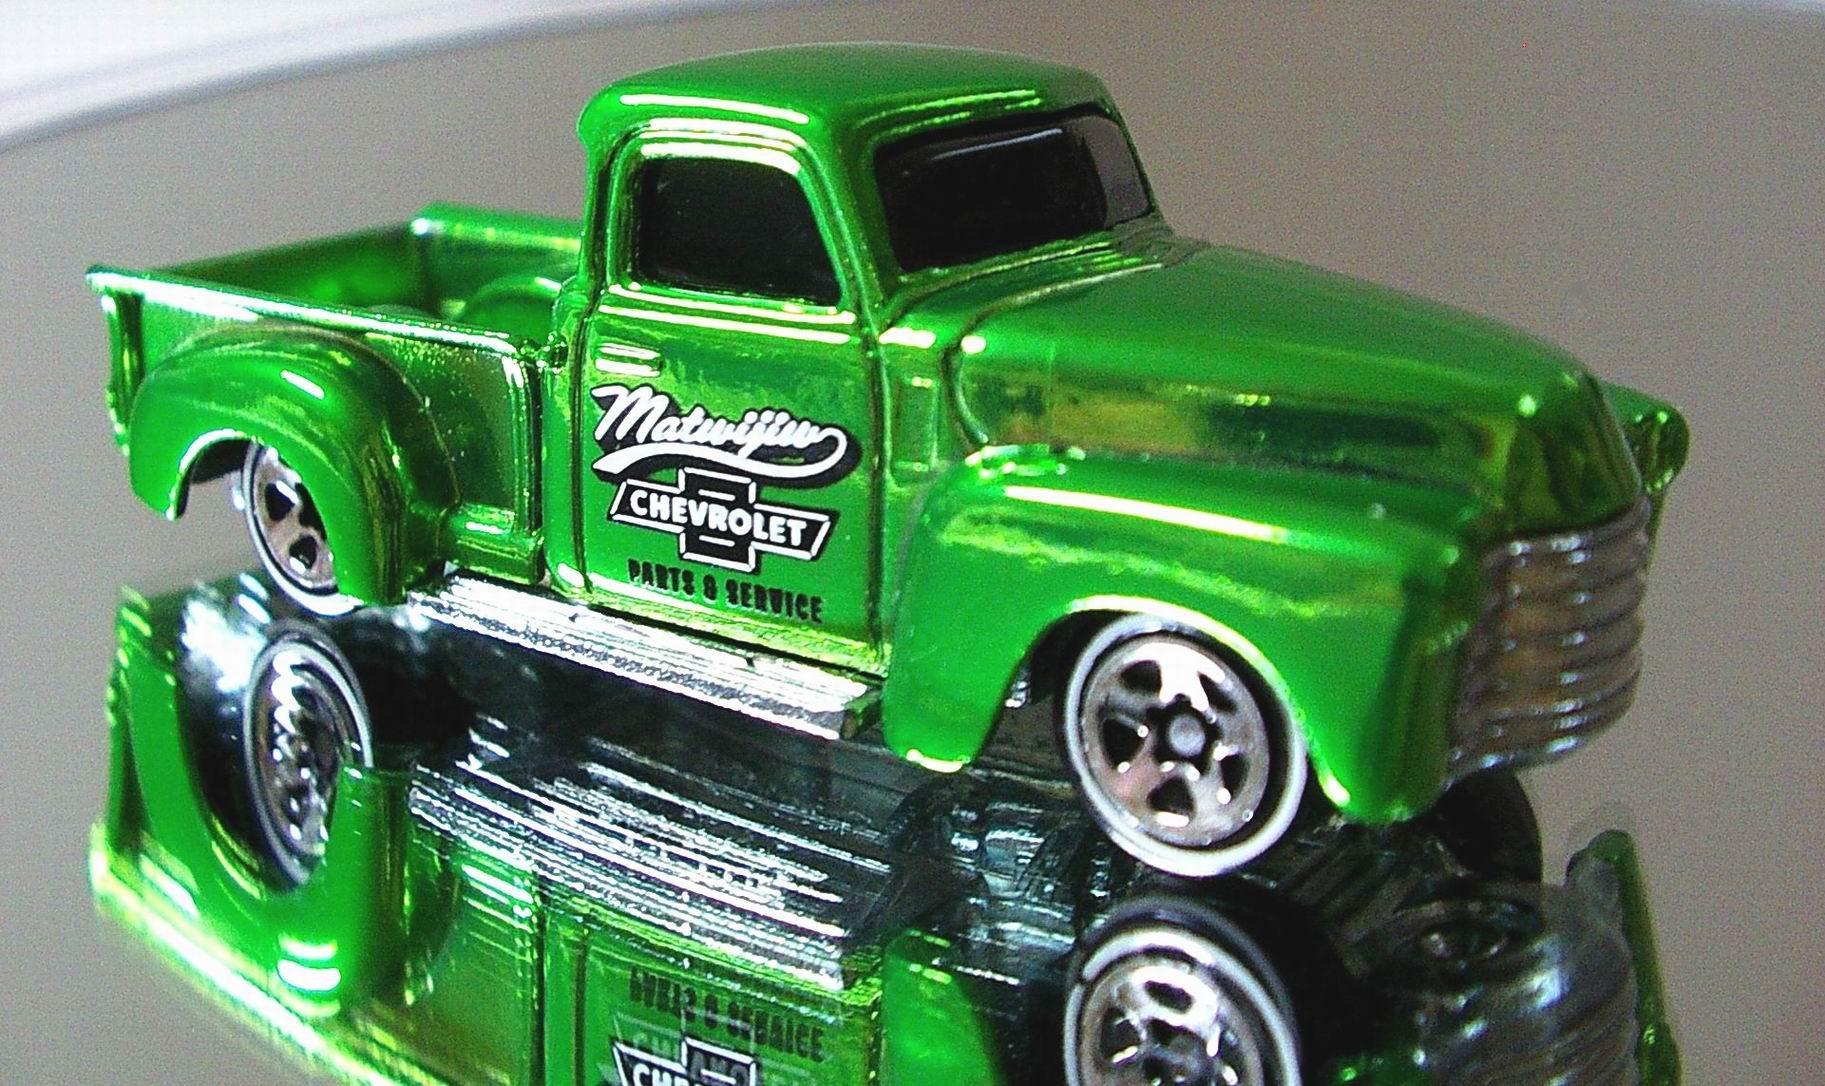 '52 Chevy Truck | Hot Wheels Wiki | FANDOM powered by Wikia